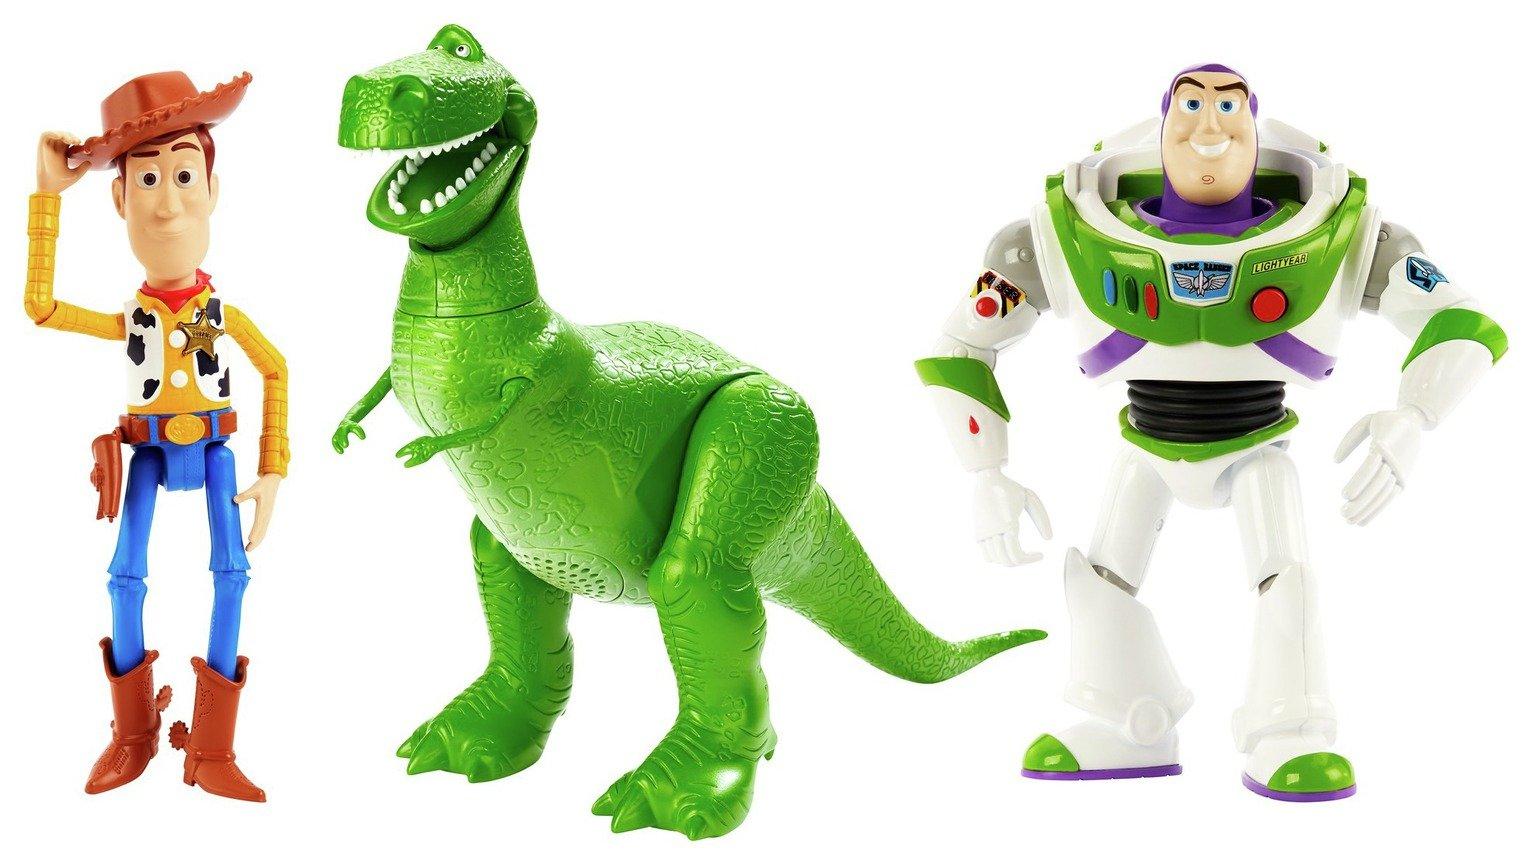 Disney Pixar Toy Story 7inch Talking Figure Assortment